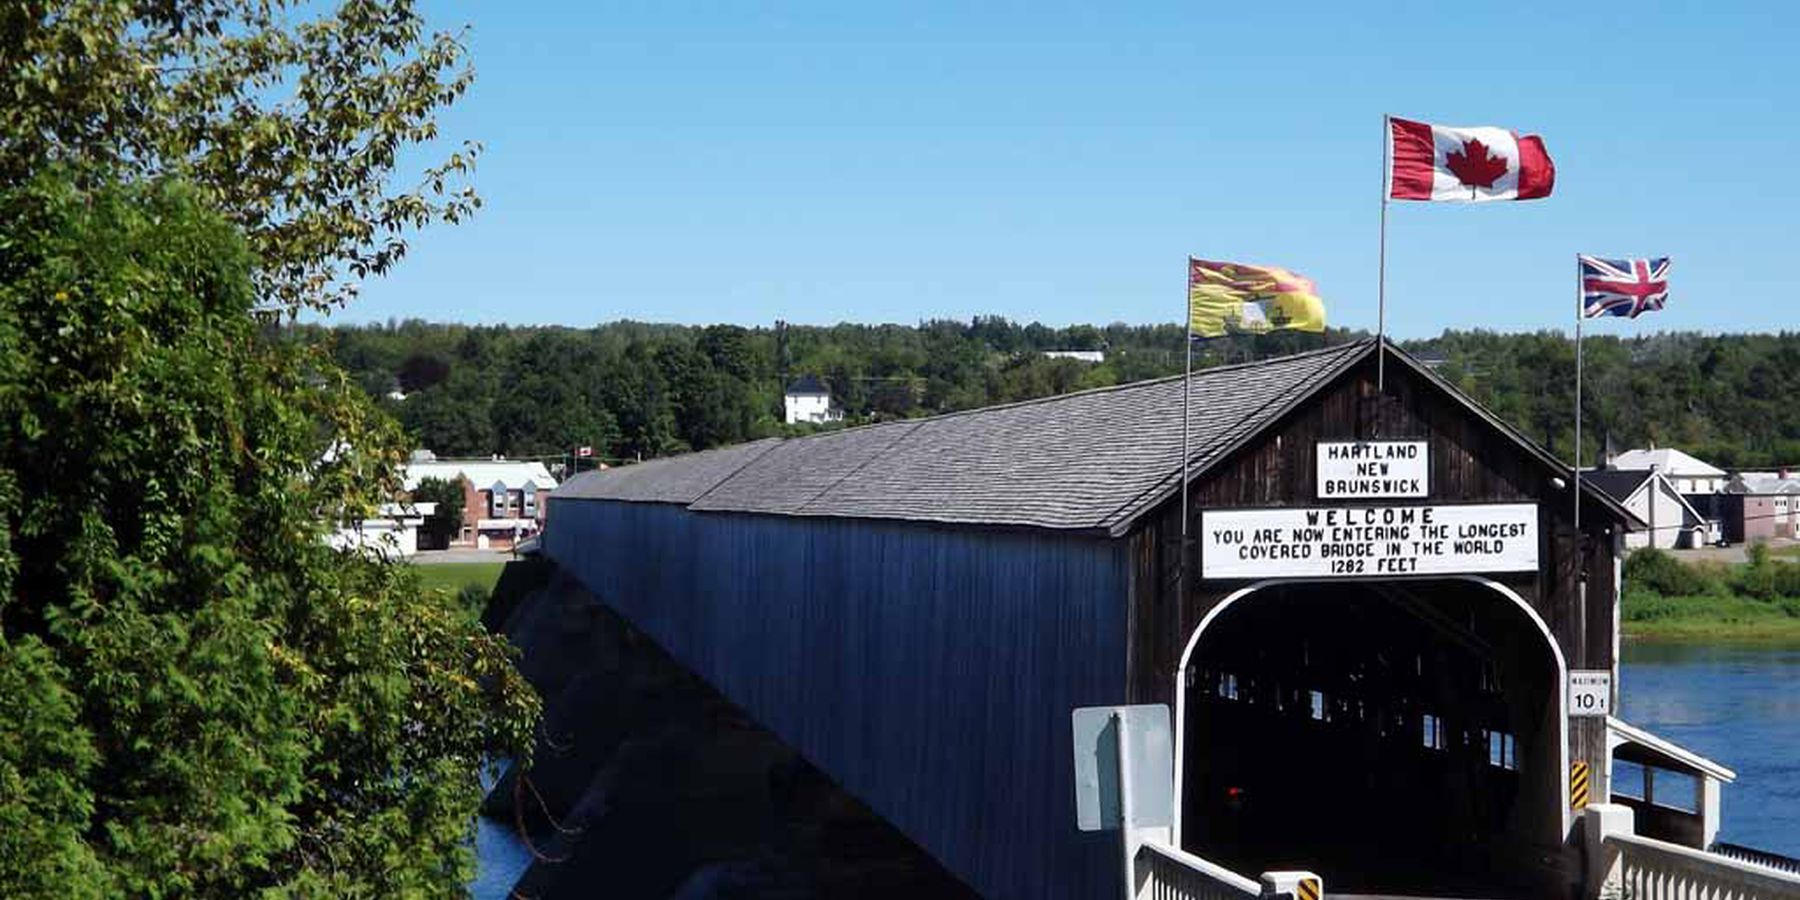 Covered Bridge - Hartland - New Brunswick - Canada - Doets Reizen